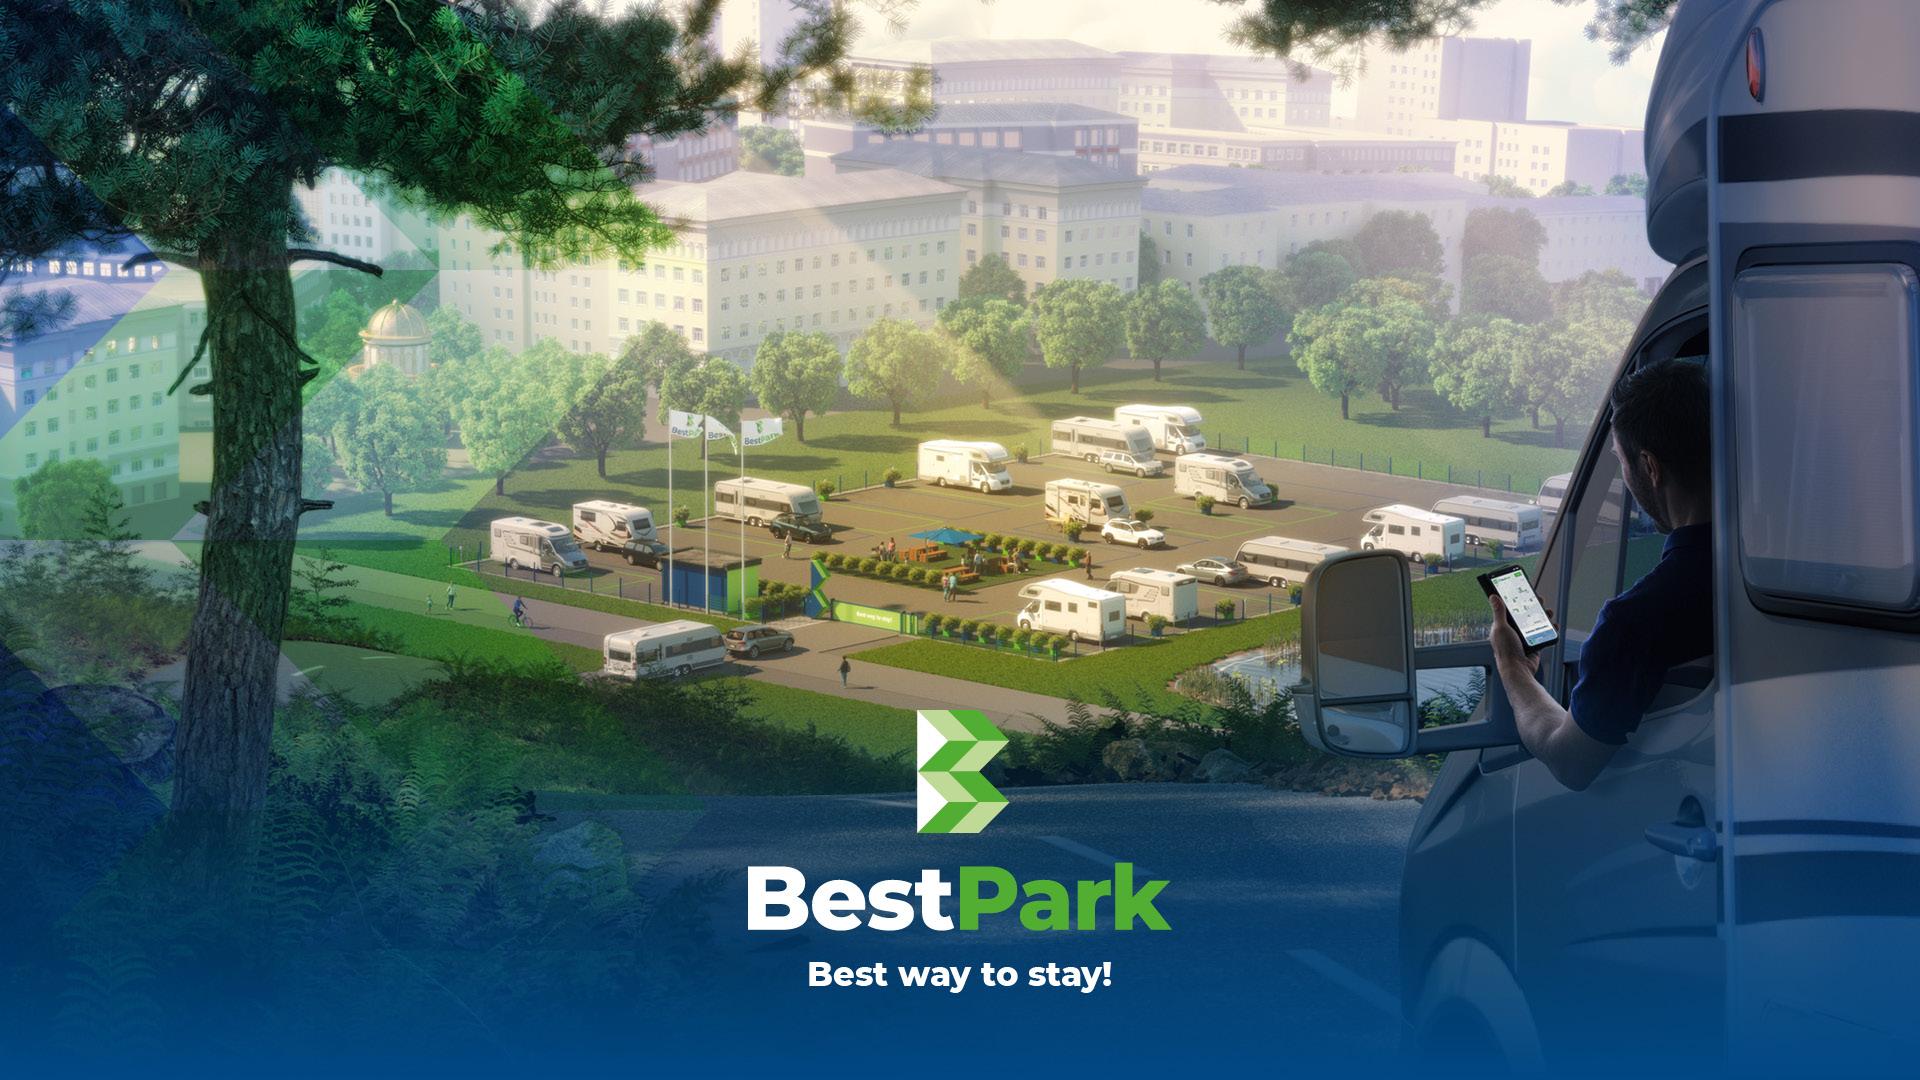 bestpark-referenssi-1.jpg